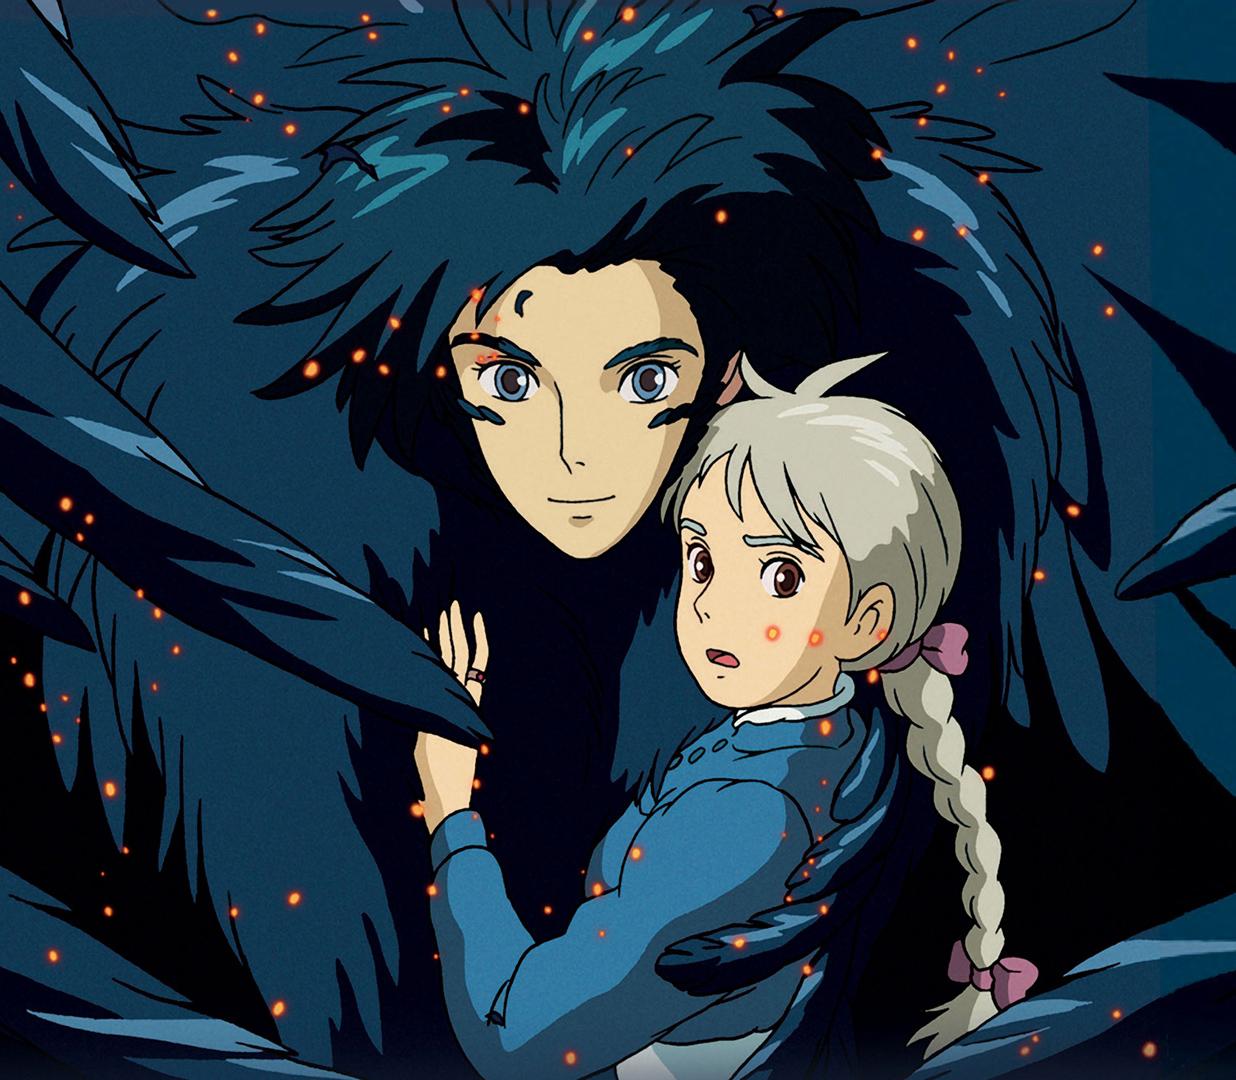 Howl's Moving Castle - 2004 -  Hayao Miyazaki